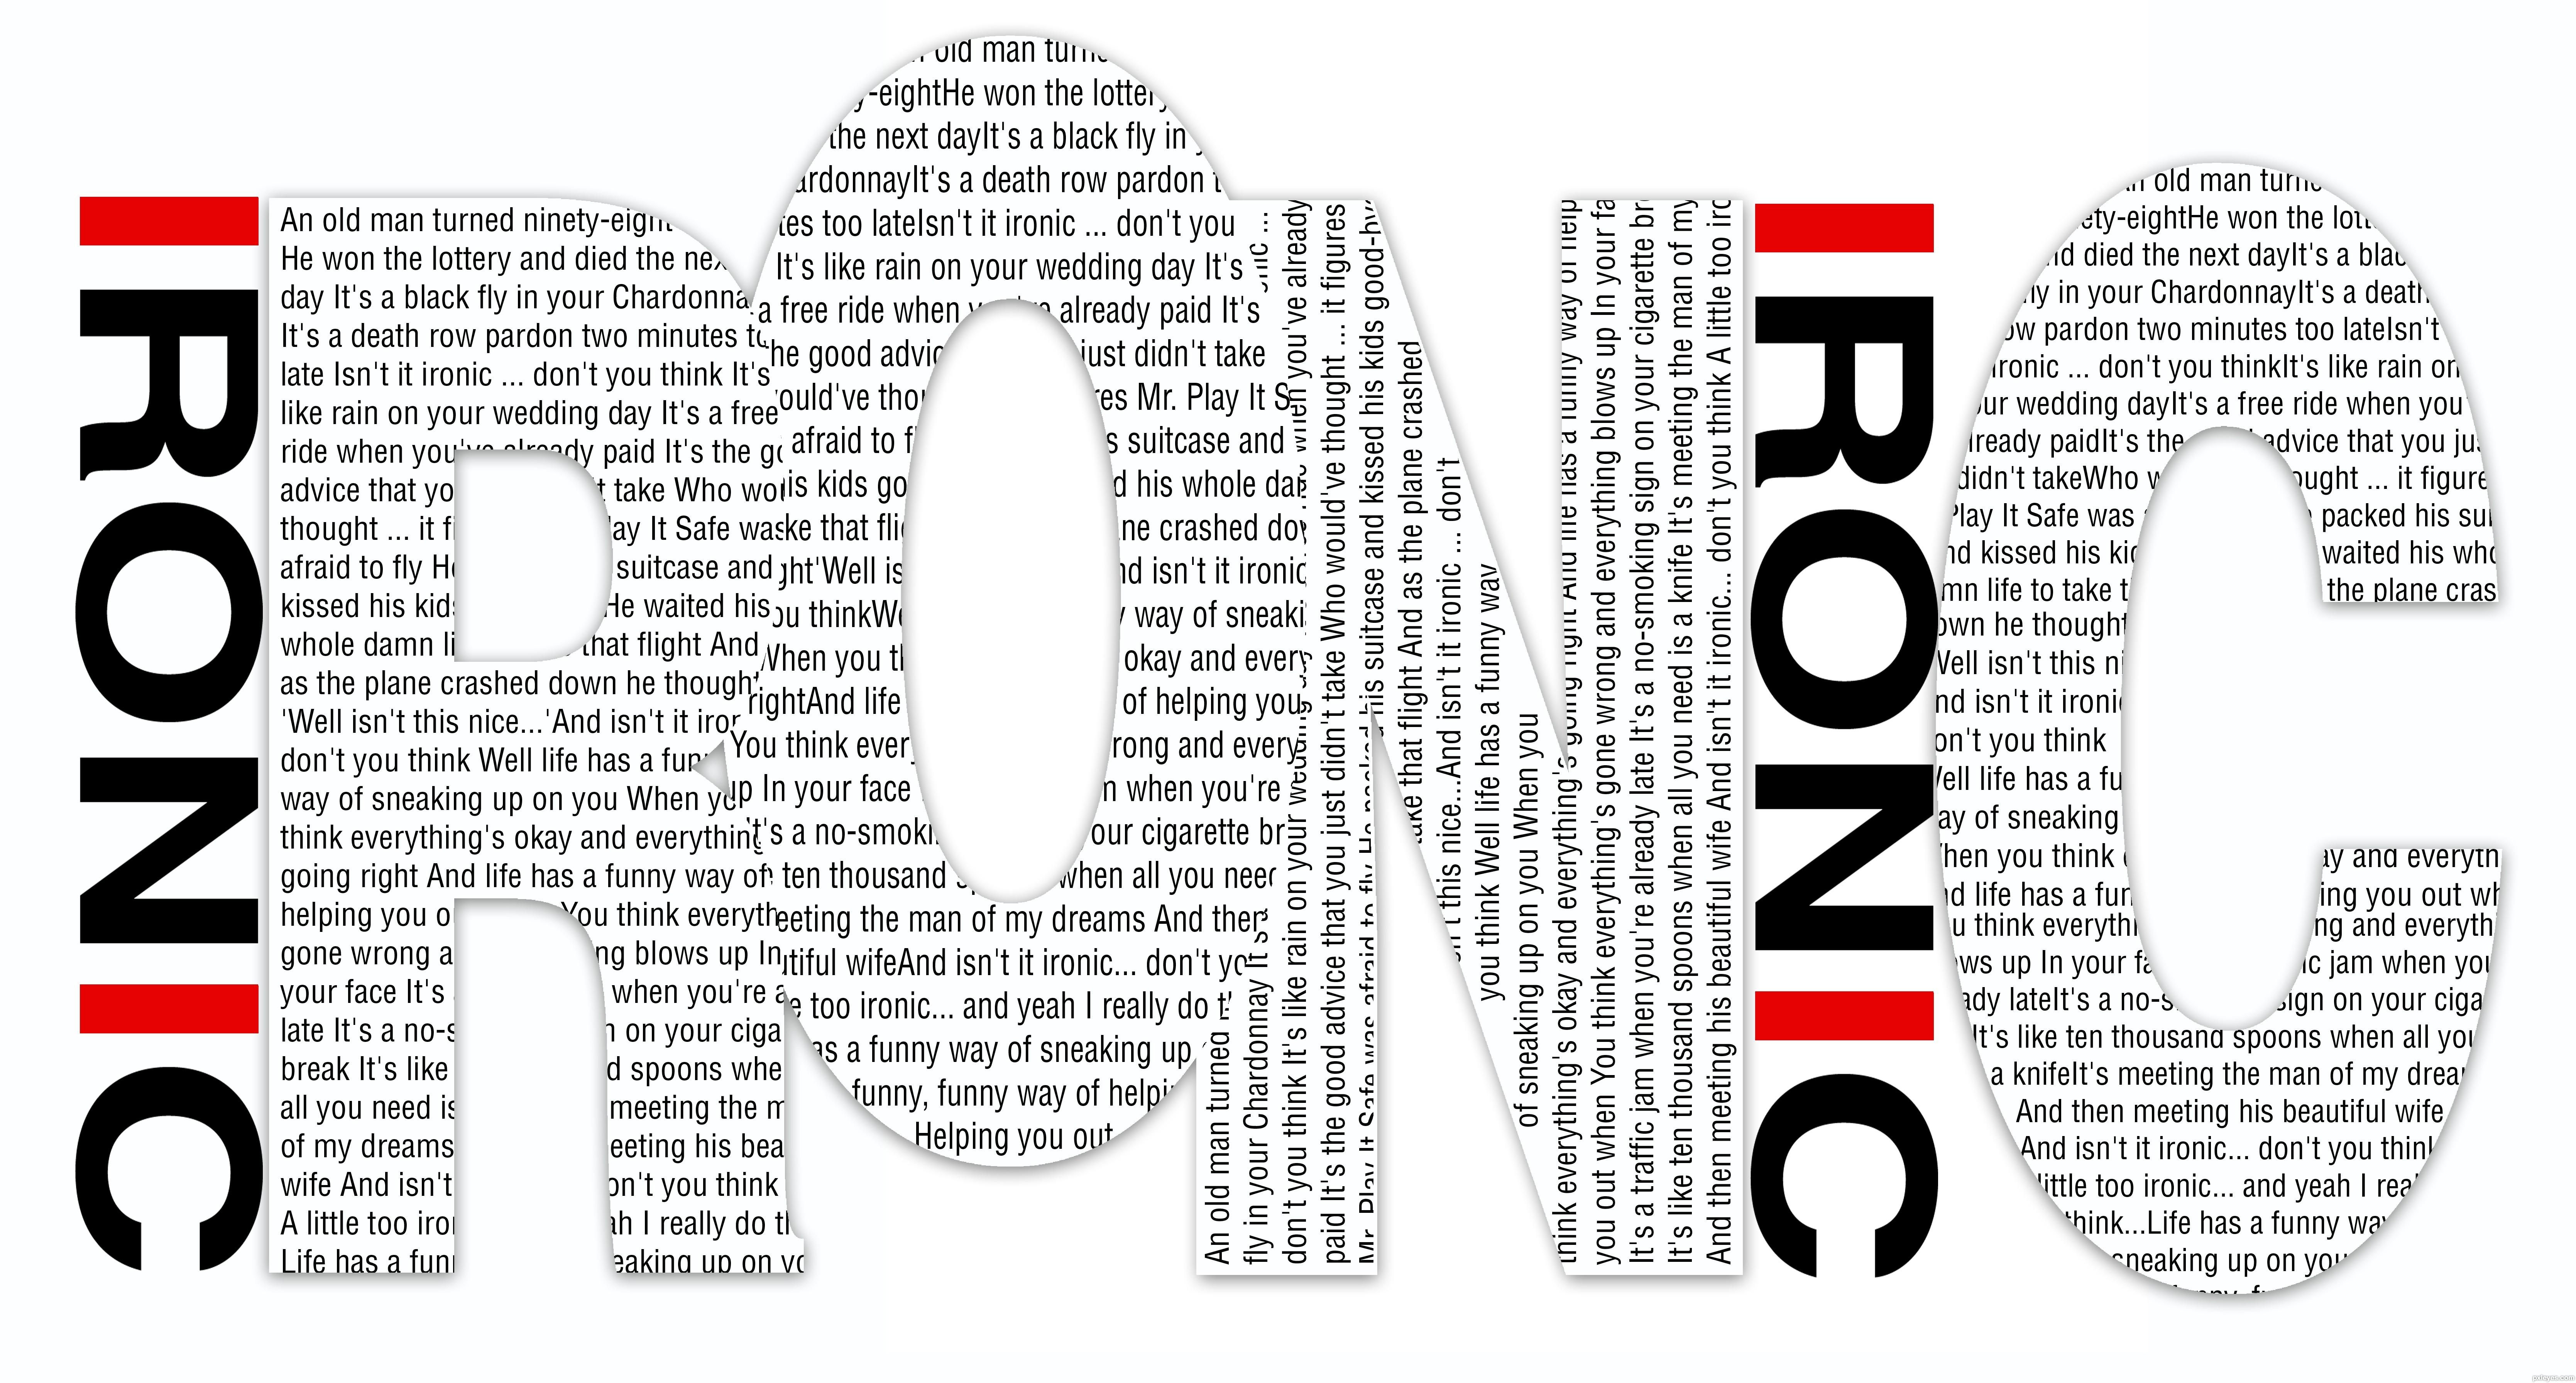 Irronic